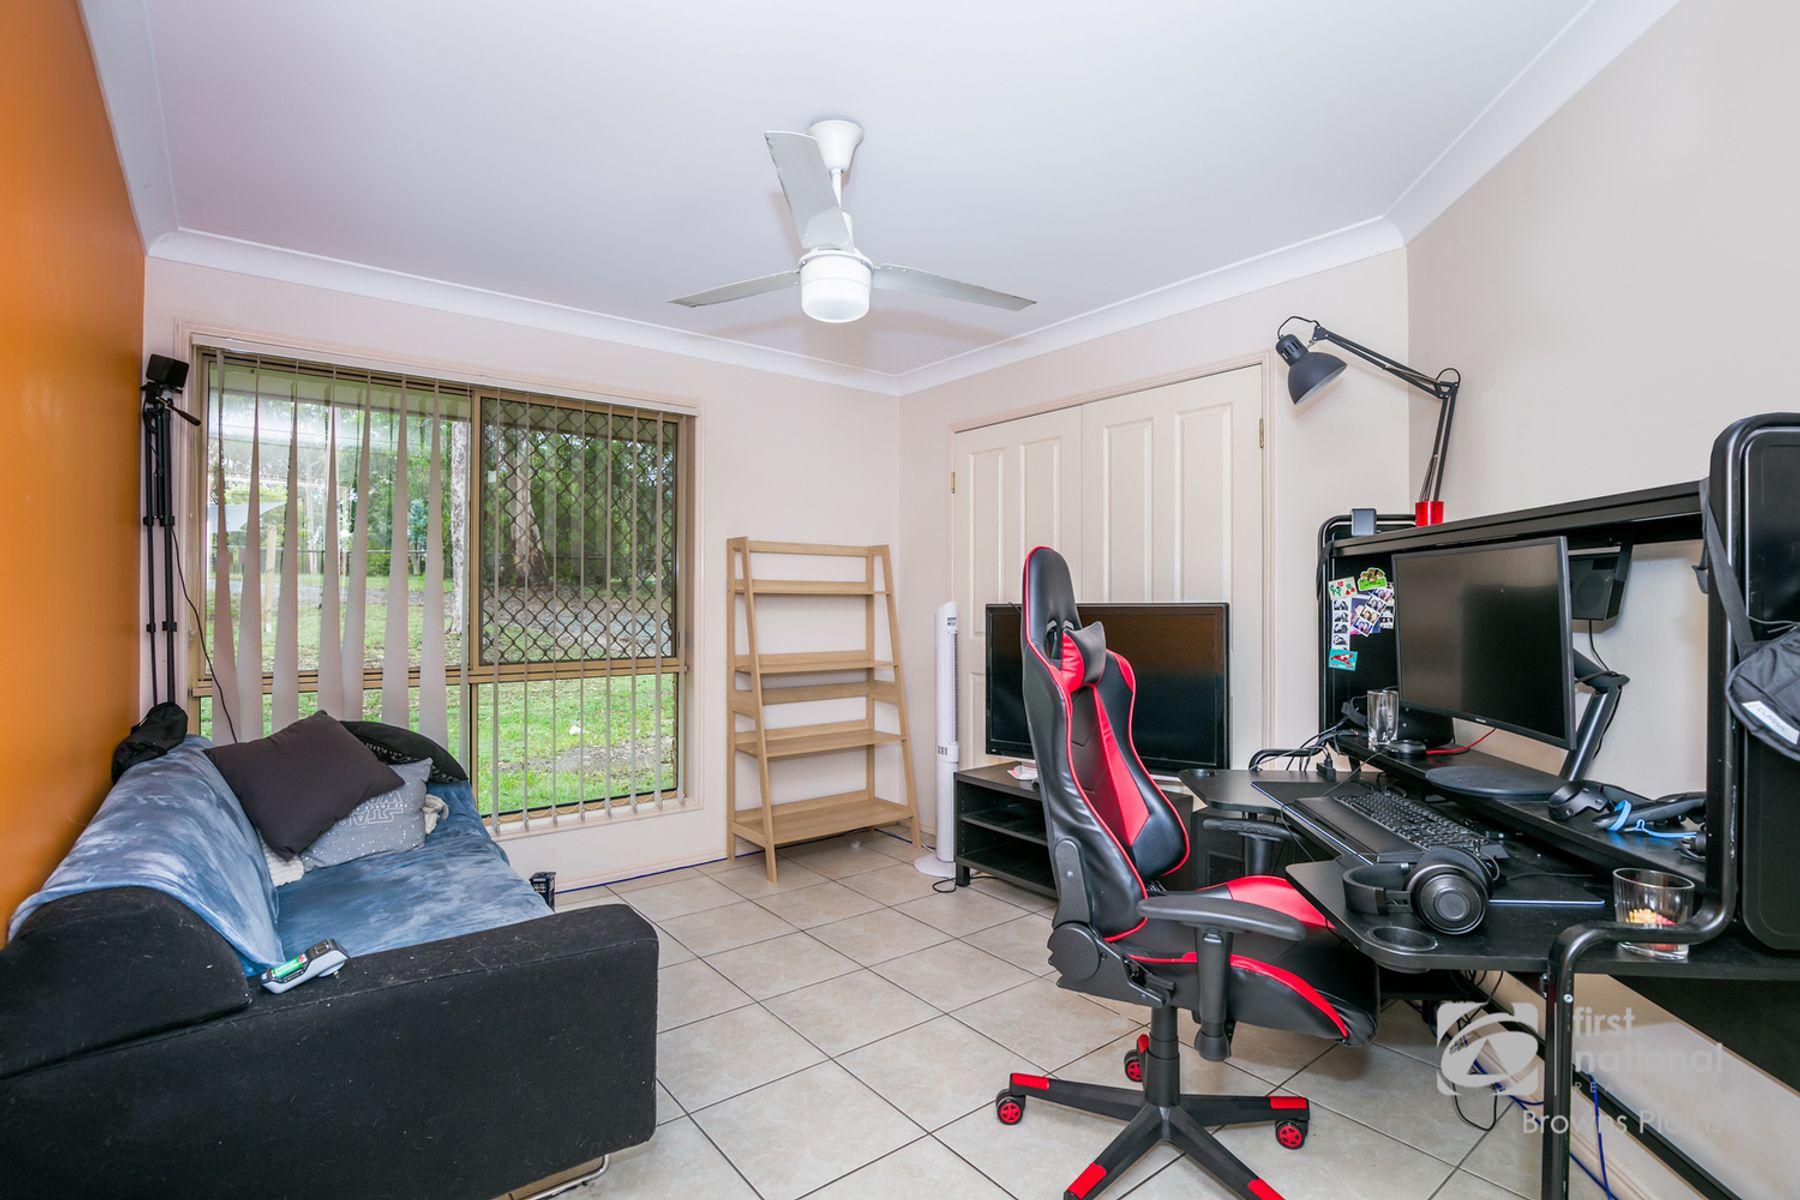 109-111 Argyle Road, Greenbank, QLD 4124